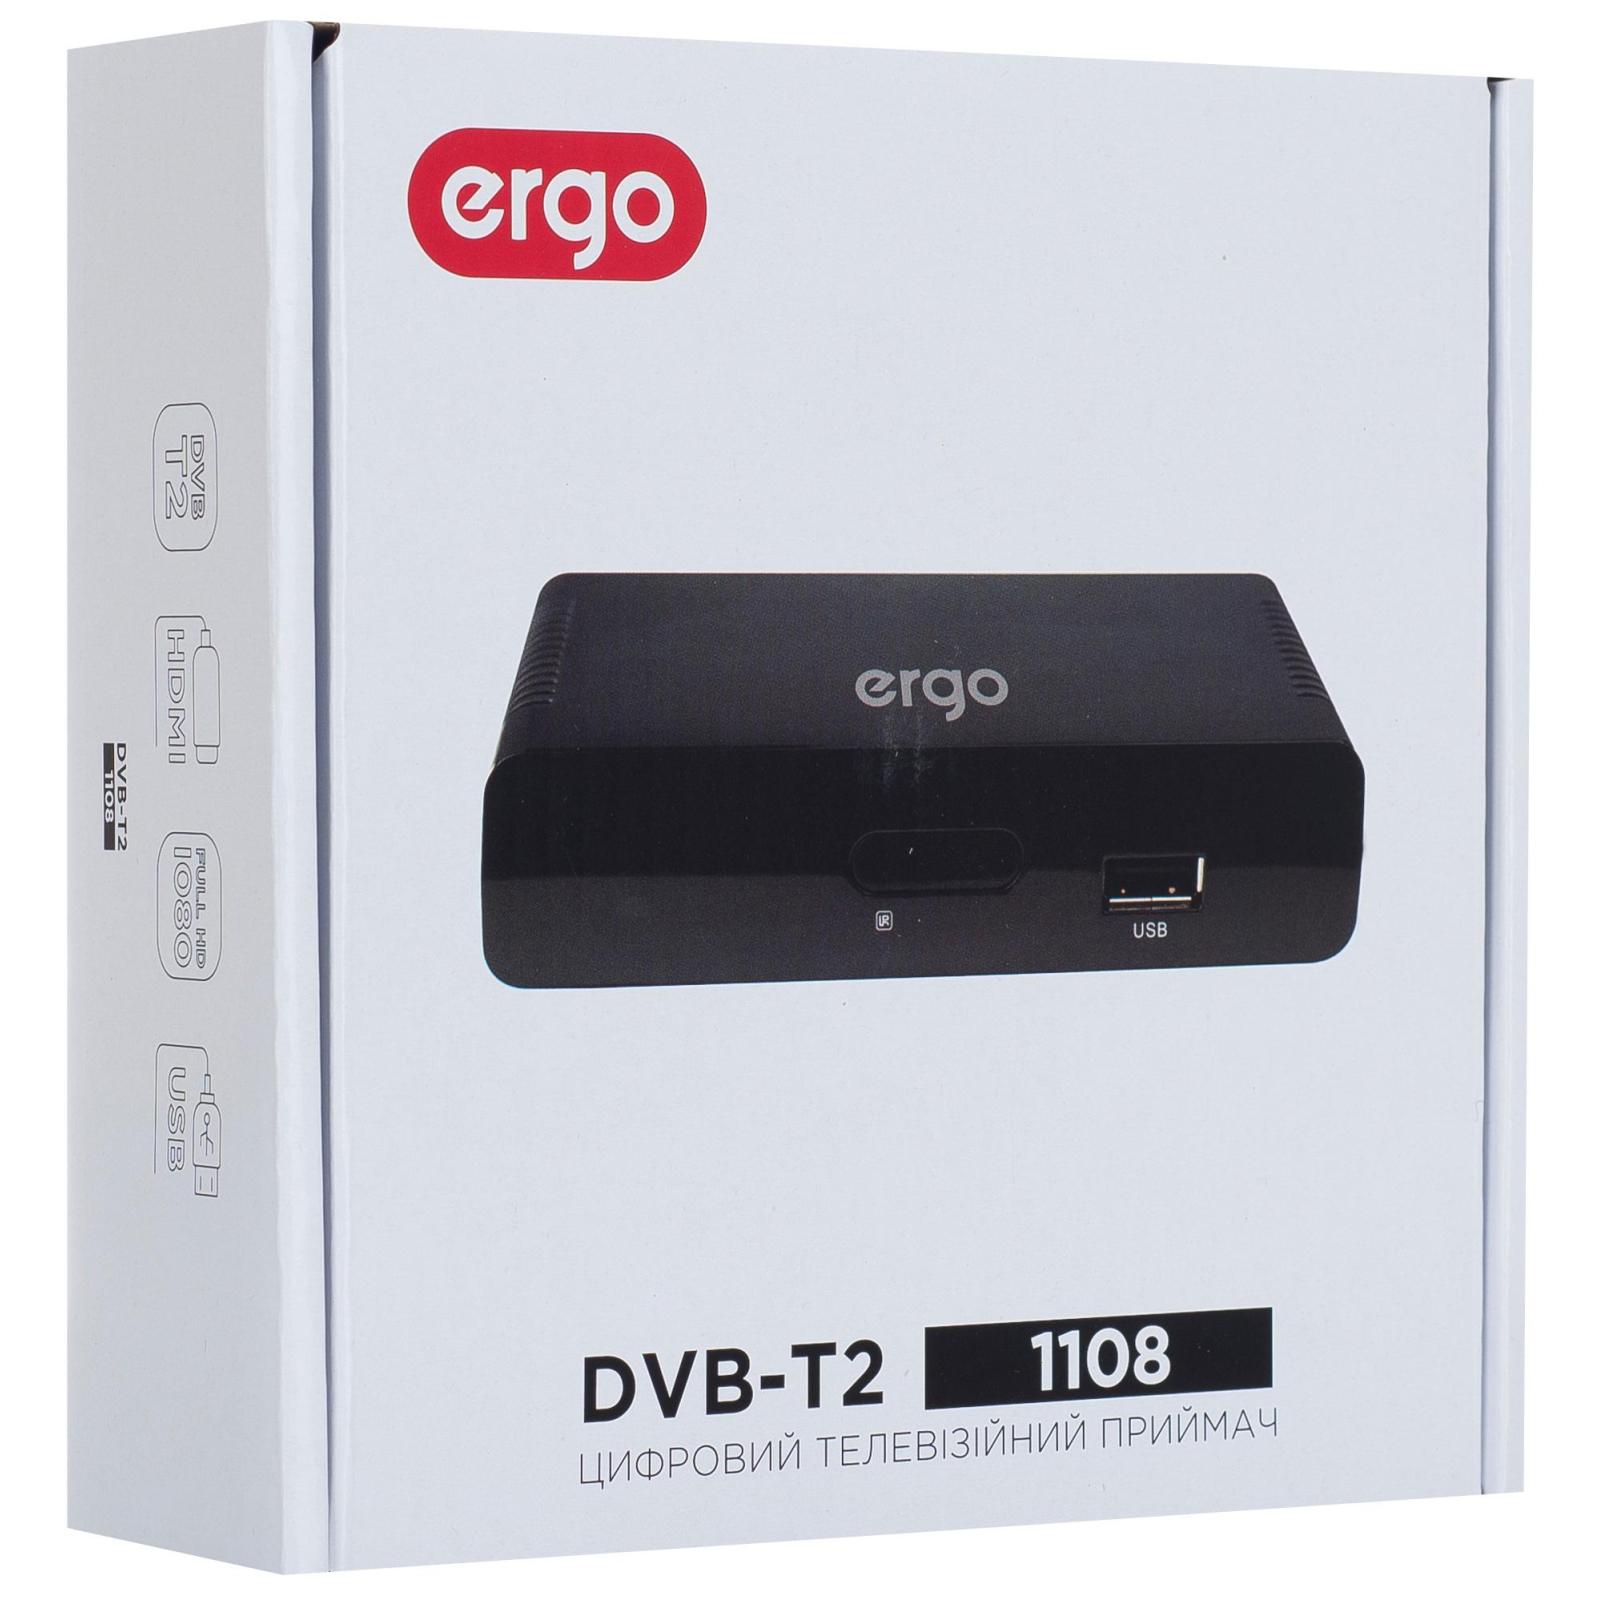 ТВ тюнер Ergo 1108 (DVB-T, DVB-T2) (STB-1108) зображення 10